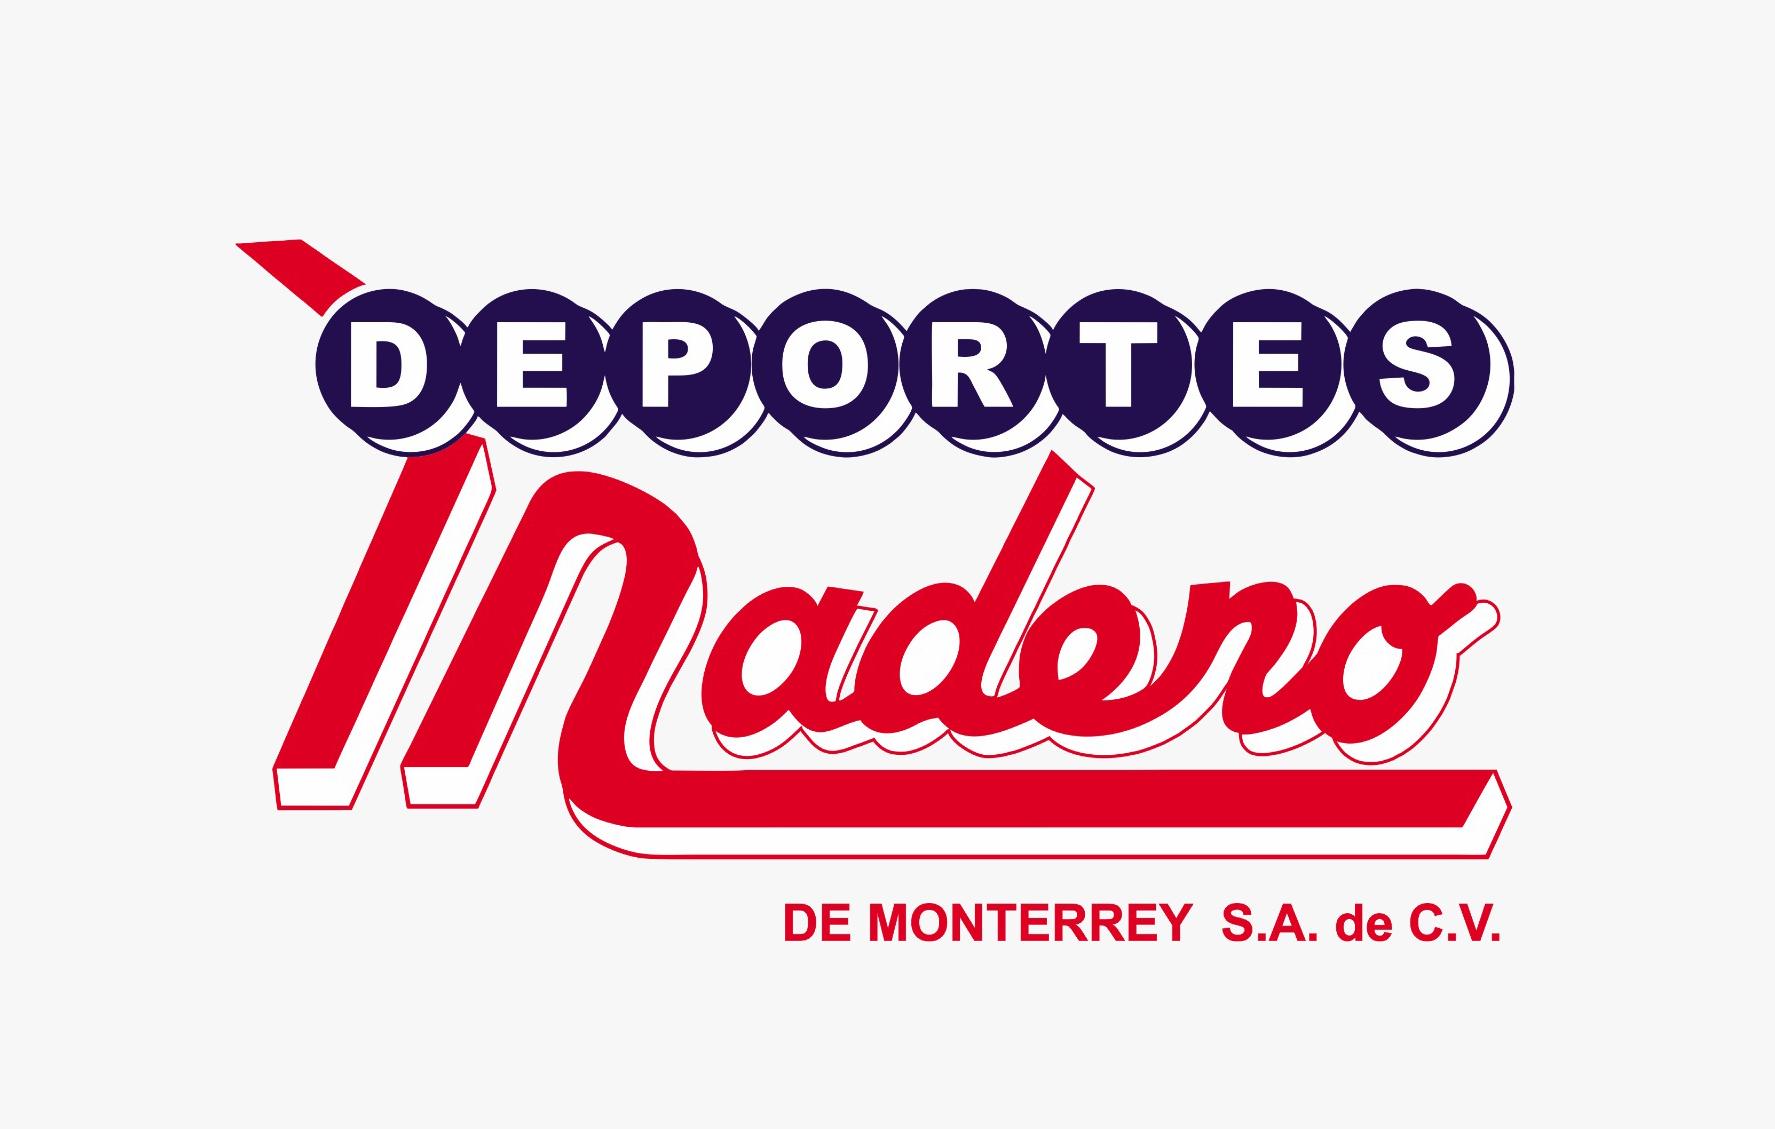 DEPORTES MADERO